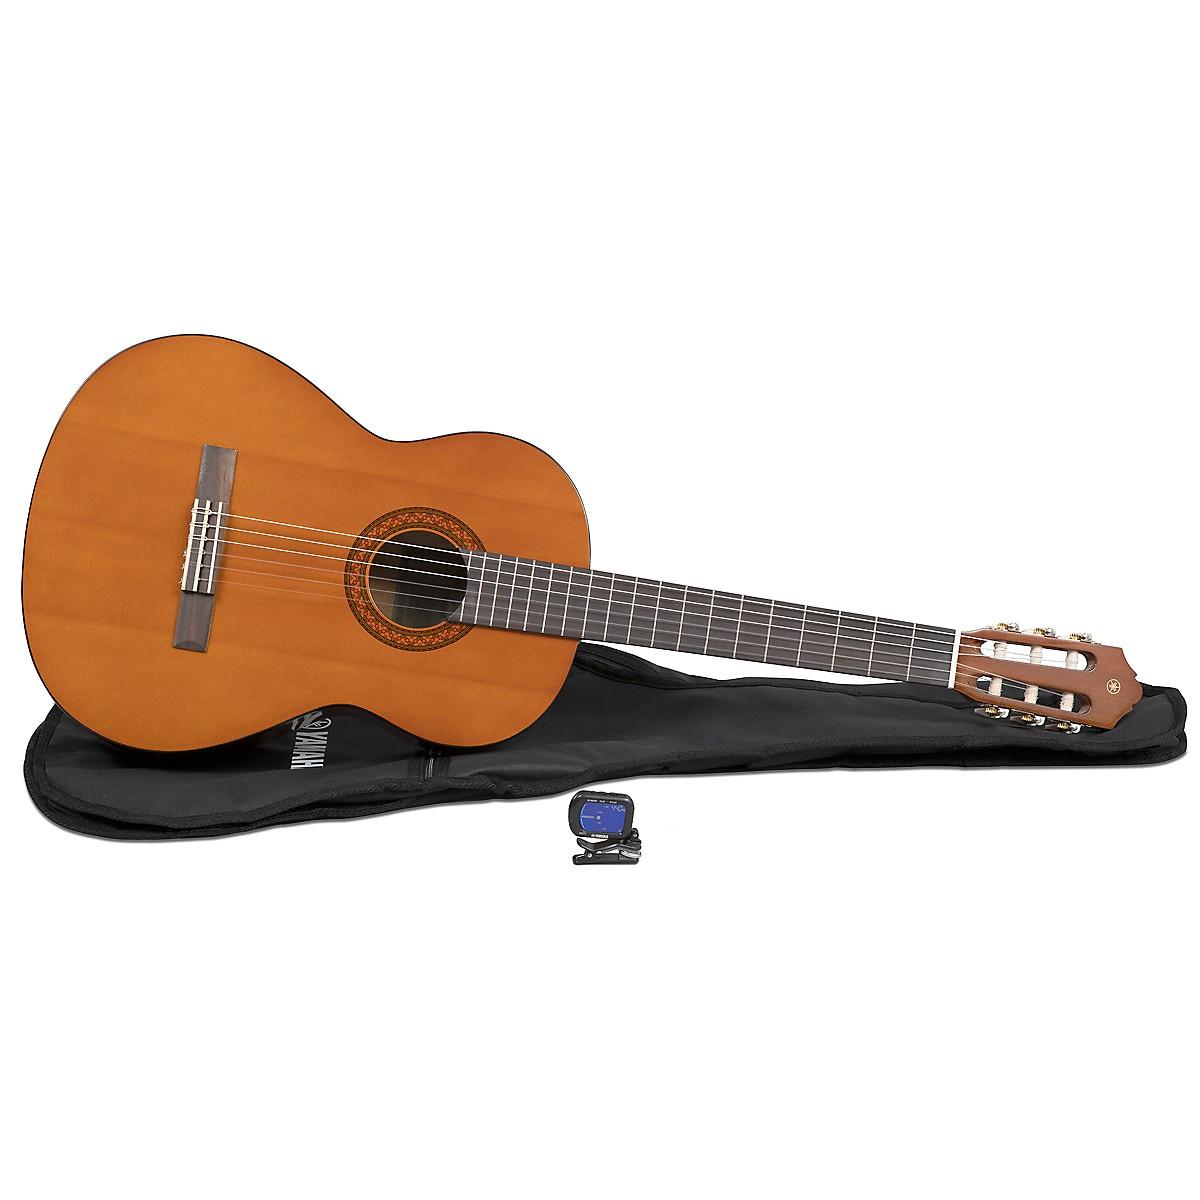 Yamaha C40 Gigmaker Classical Acoustic Guitar Pack (Natural)